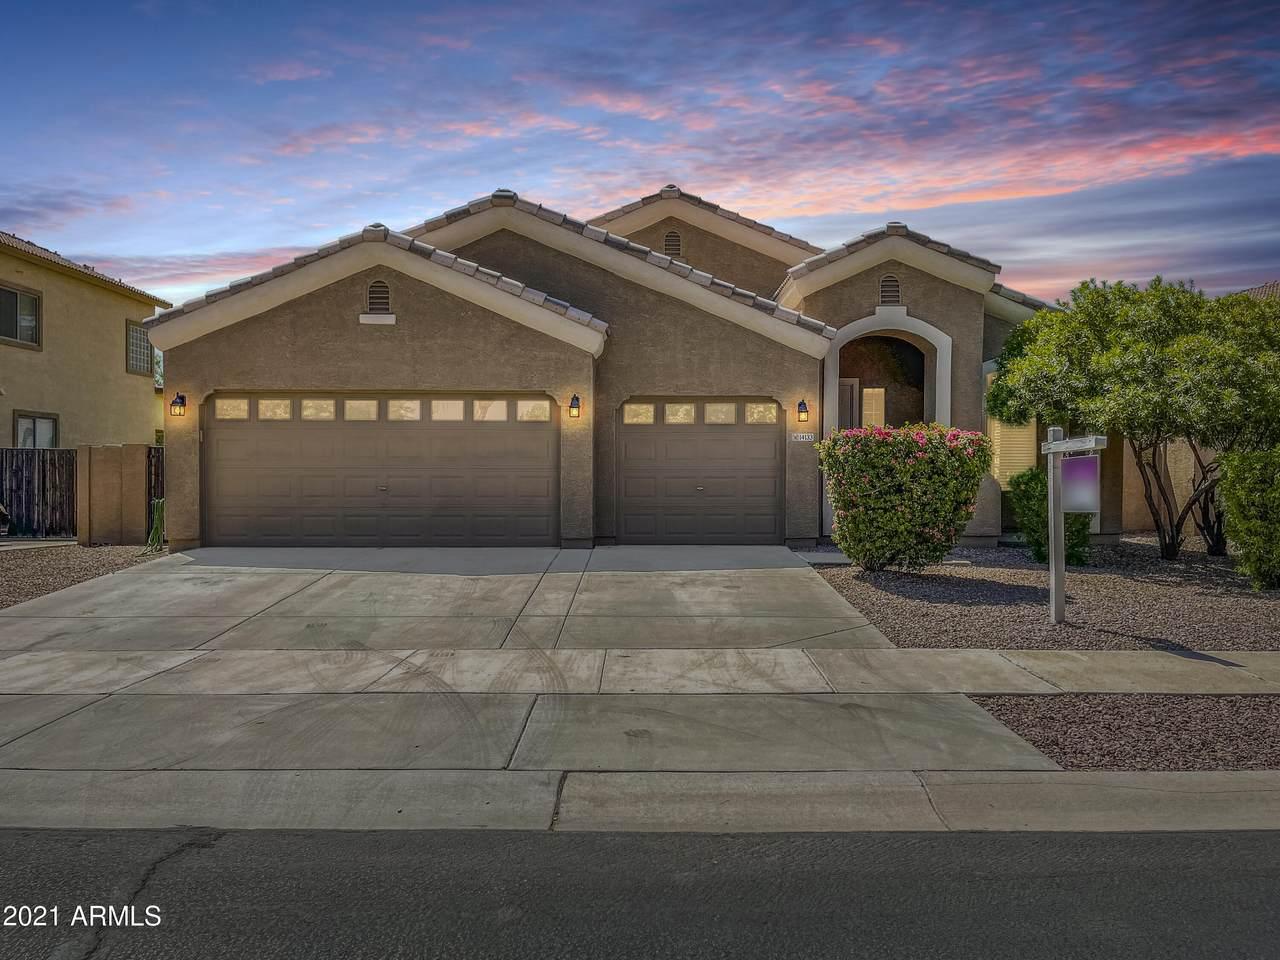 14133 Desert Hills Drive - Photo 1